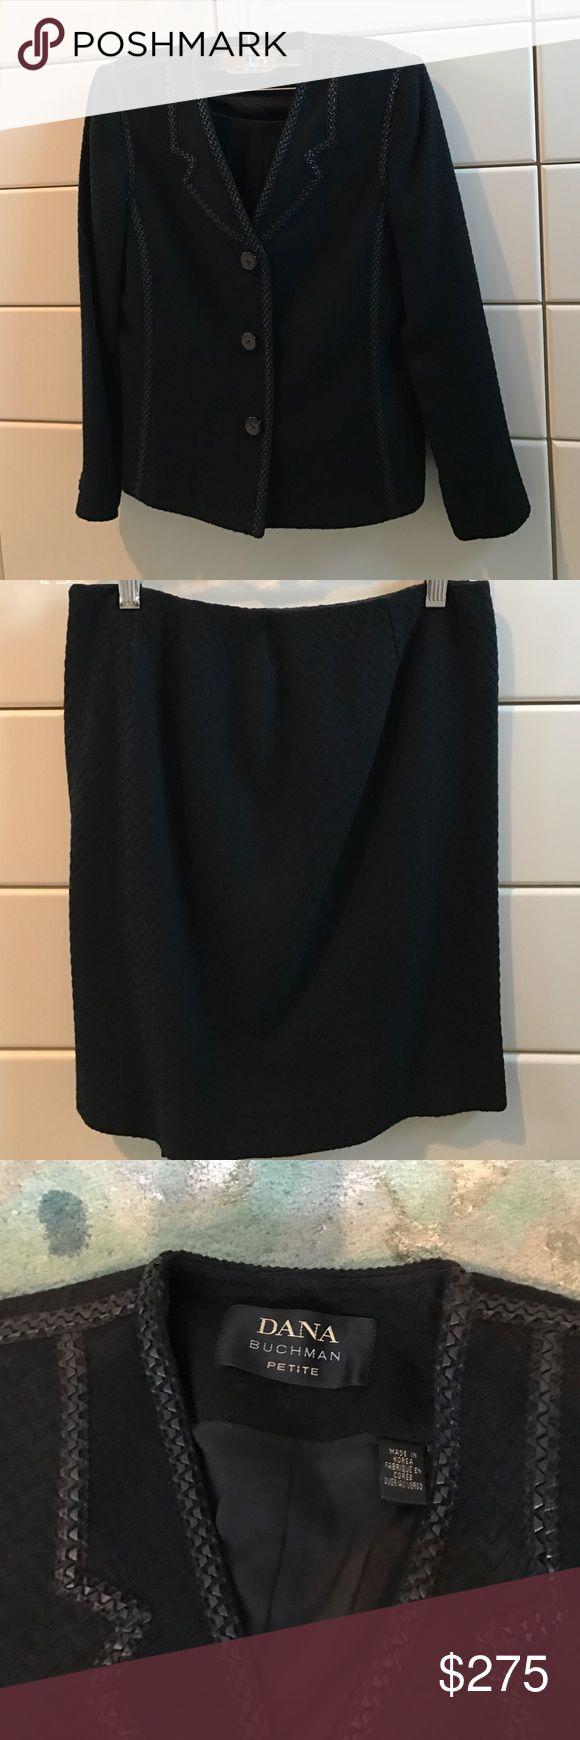 Dana Buchman Petite Suit Classic Dana Buchman leather trimmed skirt suit. Purchased at Neiman Marcus. Dana Buchman Other